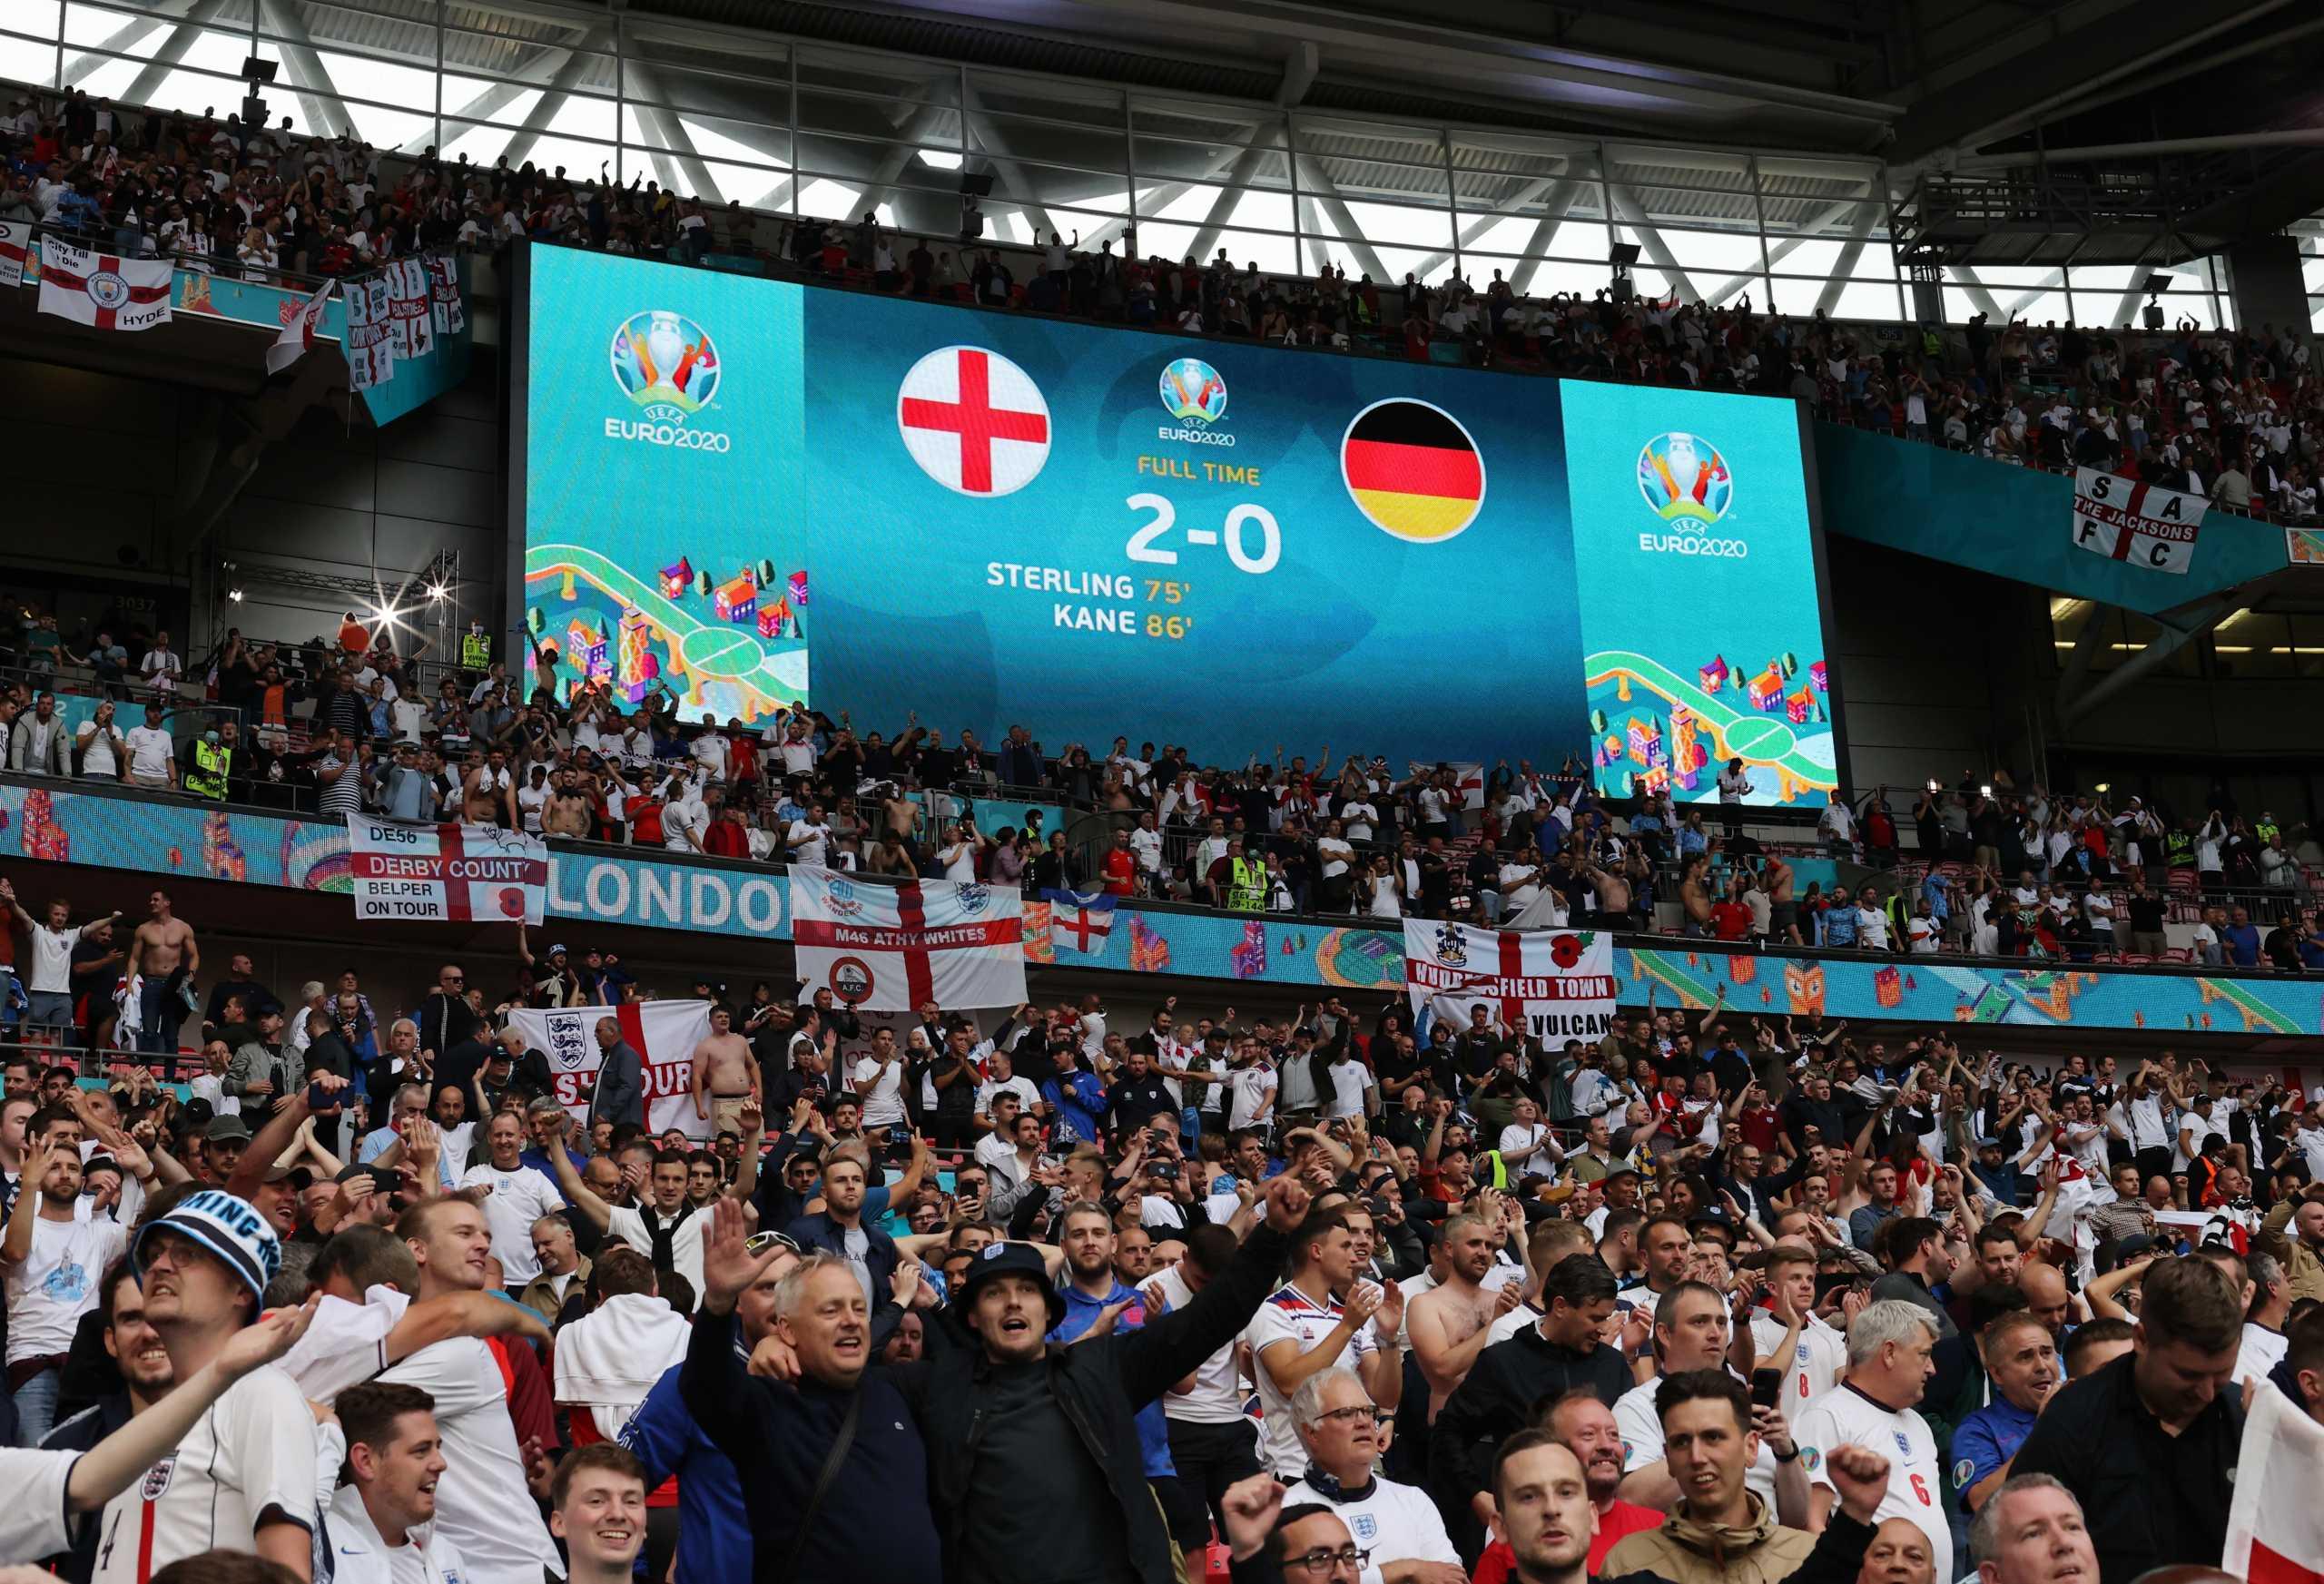 Euro 2020: Η UEFA ακύρωσε τα εισιτήρια των Άγγλων λόγω της μετάλλαξης «Δέλτα»